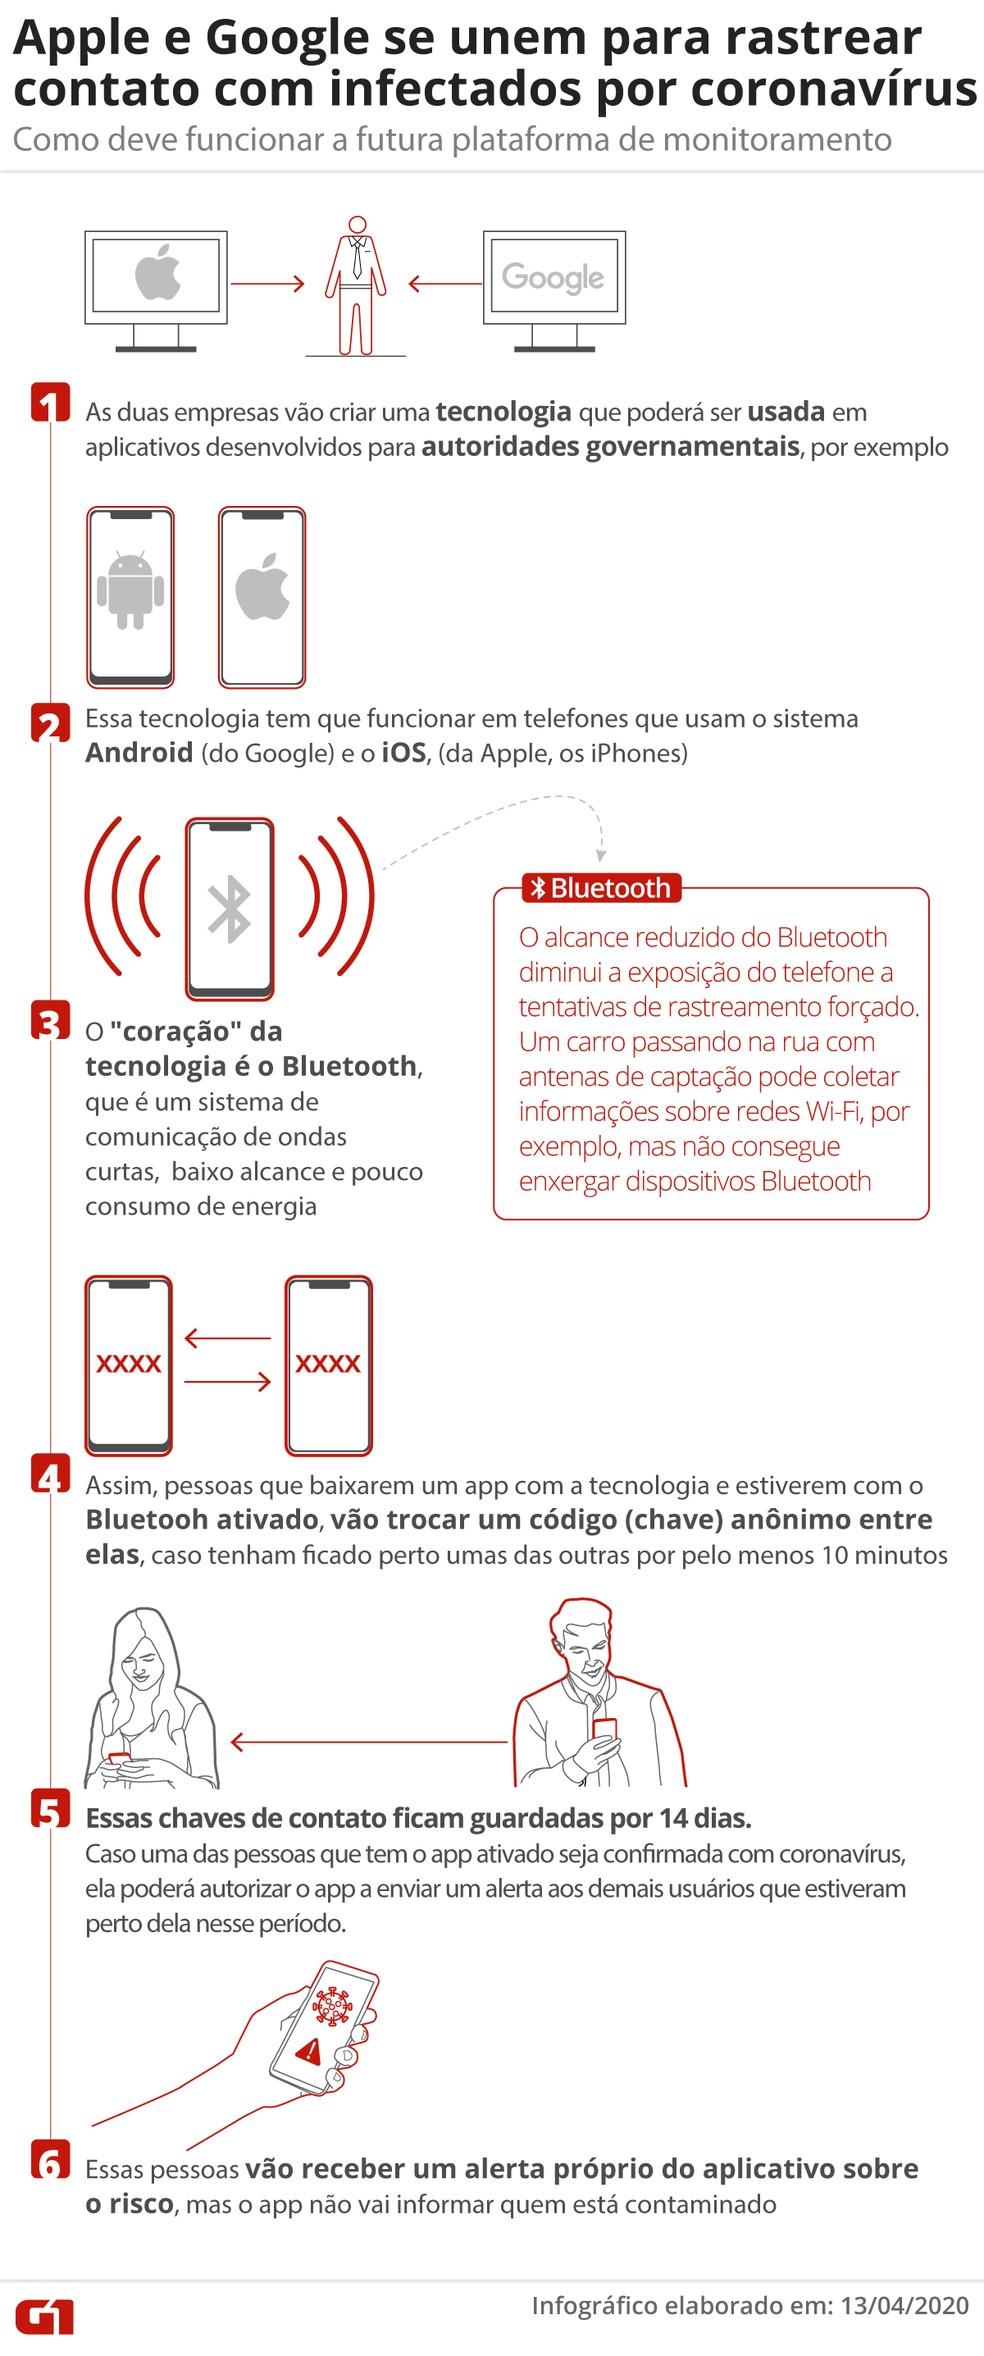 Apple e Google prometem tecnologia conjunta para combater a pandemia de coronavírus — Foto: Aparecido Gonçalves/Rafael Miotto/G1